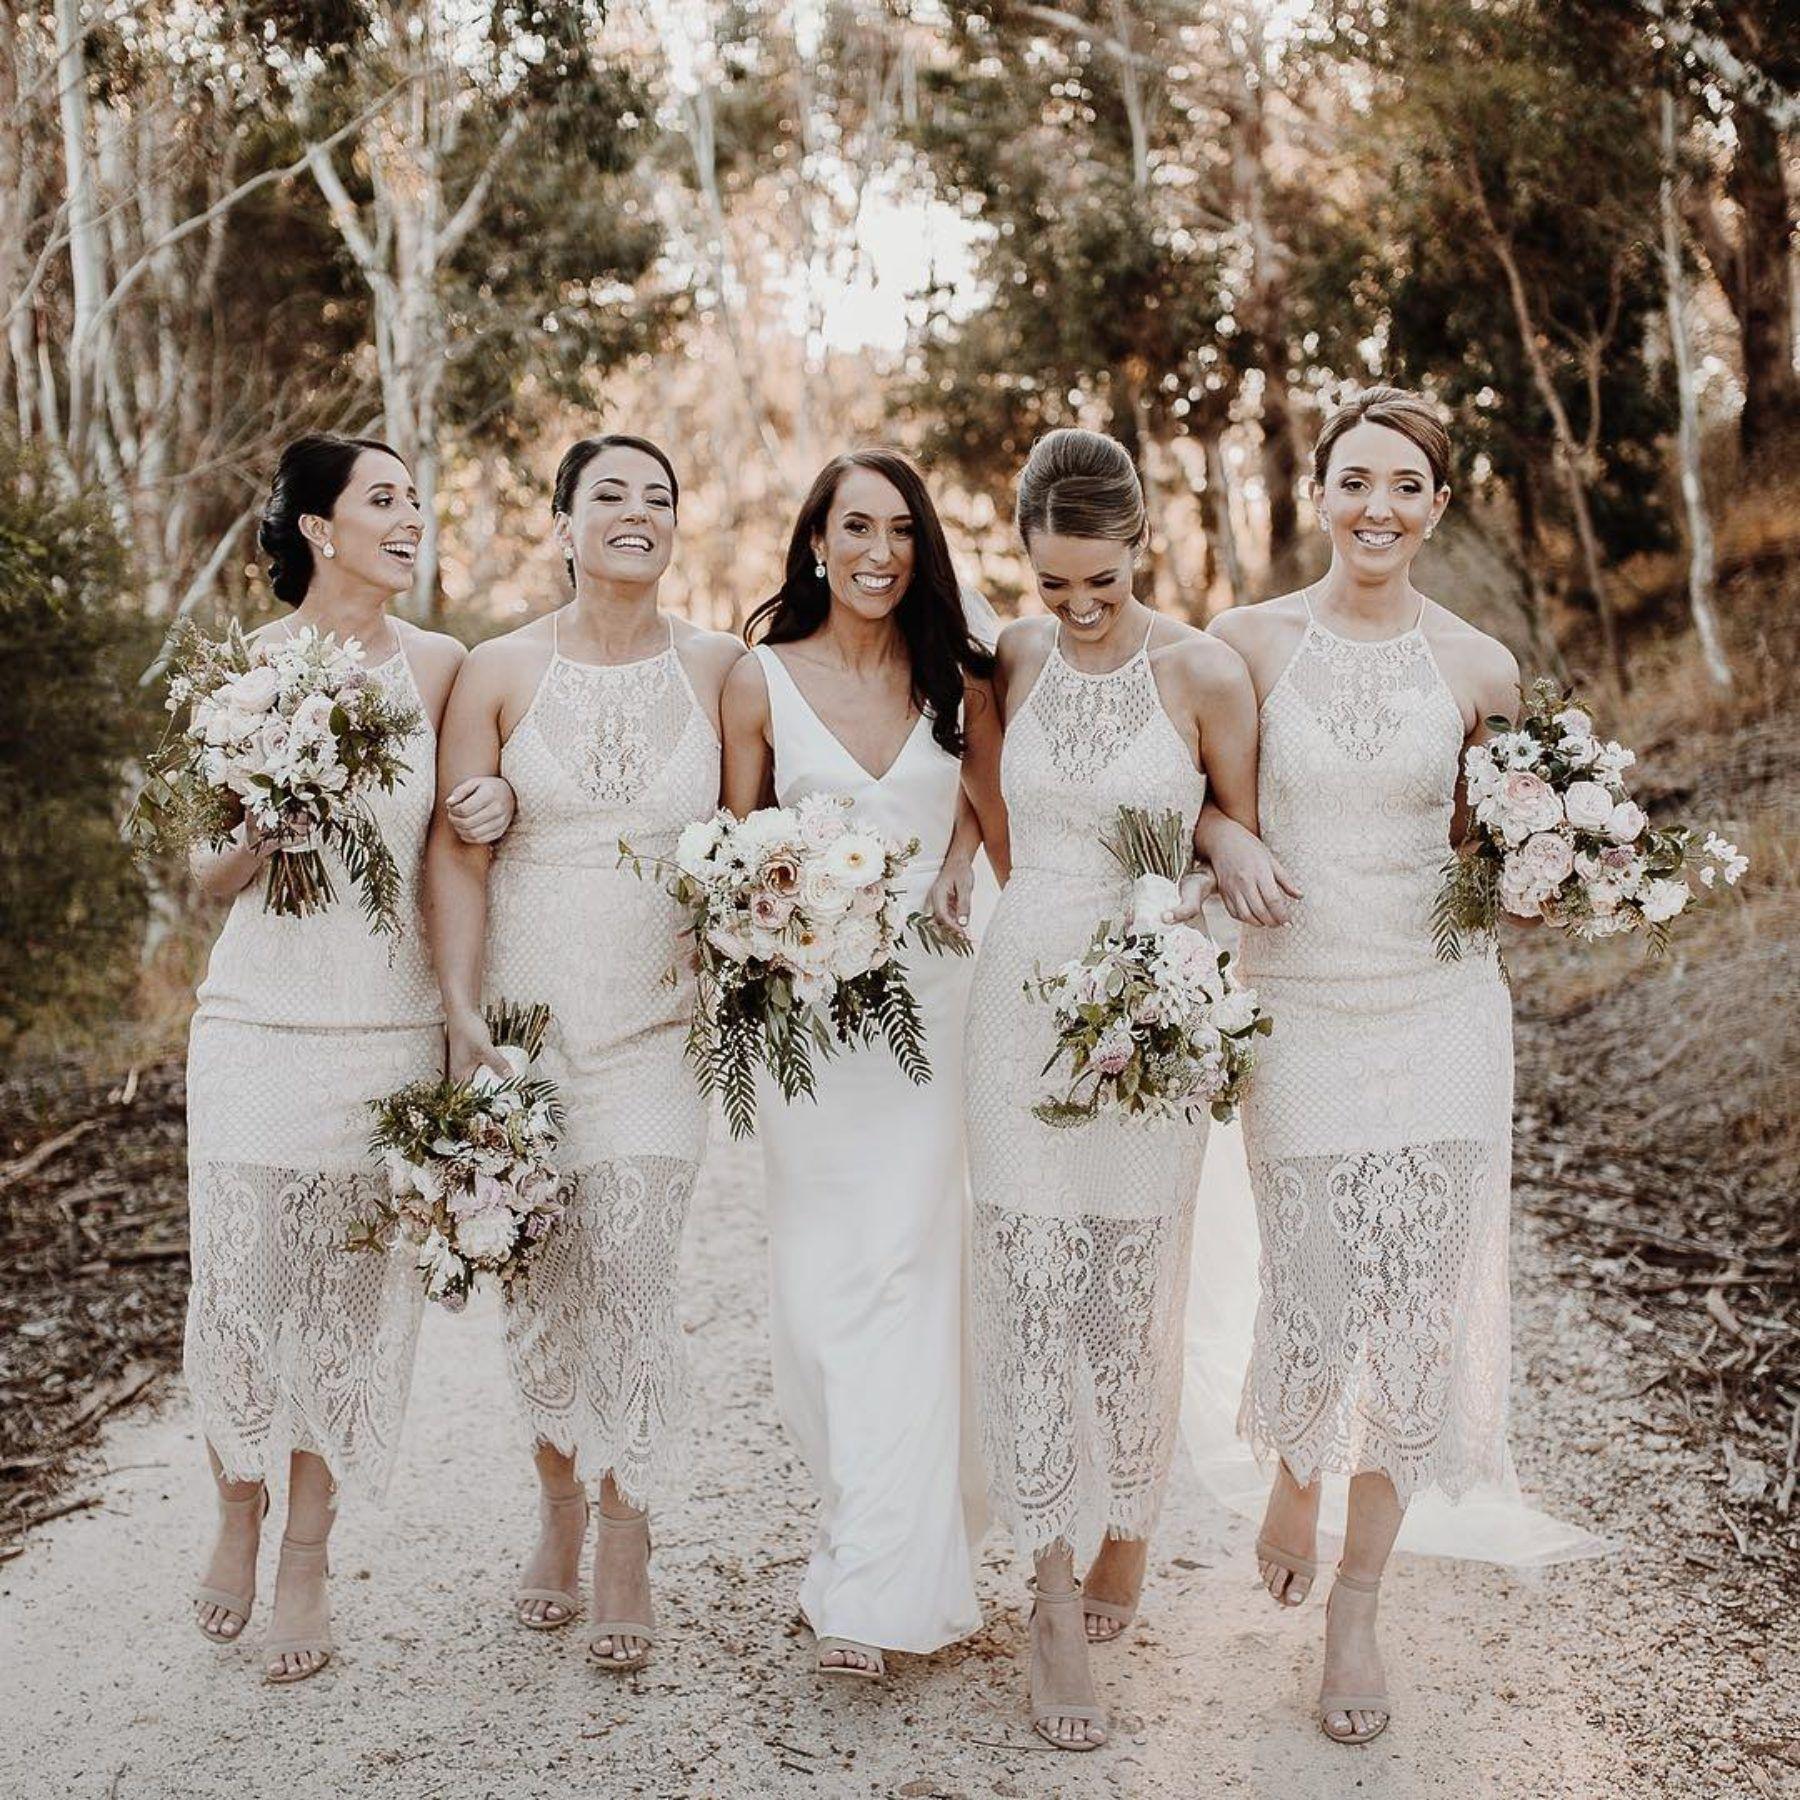 Bridesmaids Only / best bridesmaid dresses in Australia #lacebridesmaids